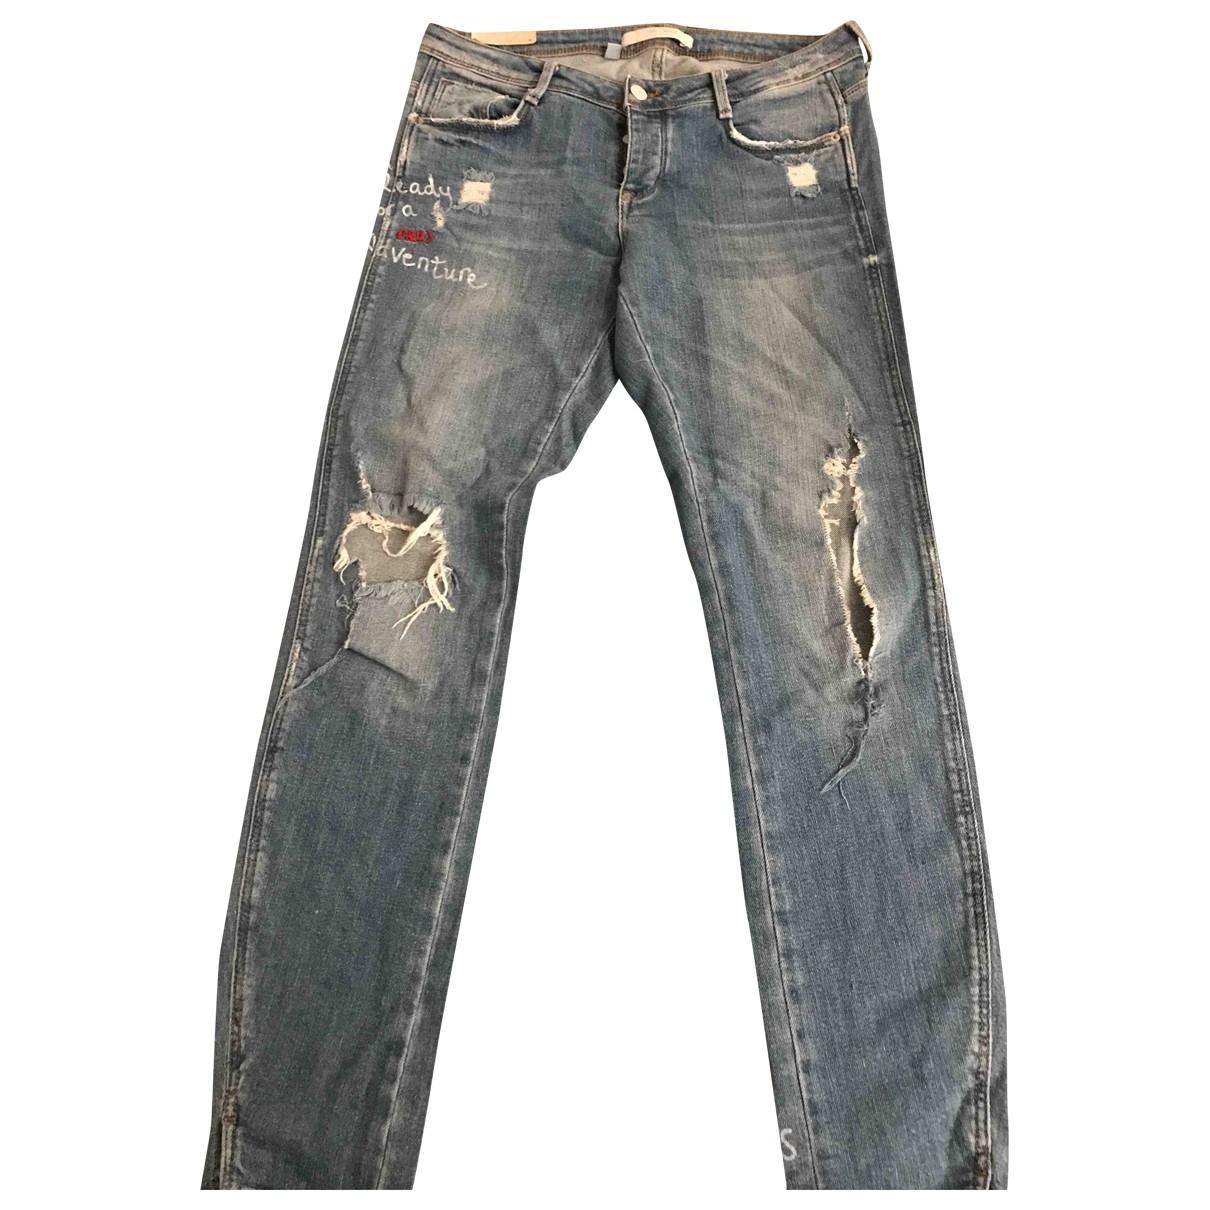 Zara \N Blue Denim - Jeans Jeans for Women 38 FR